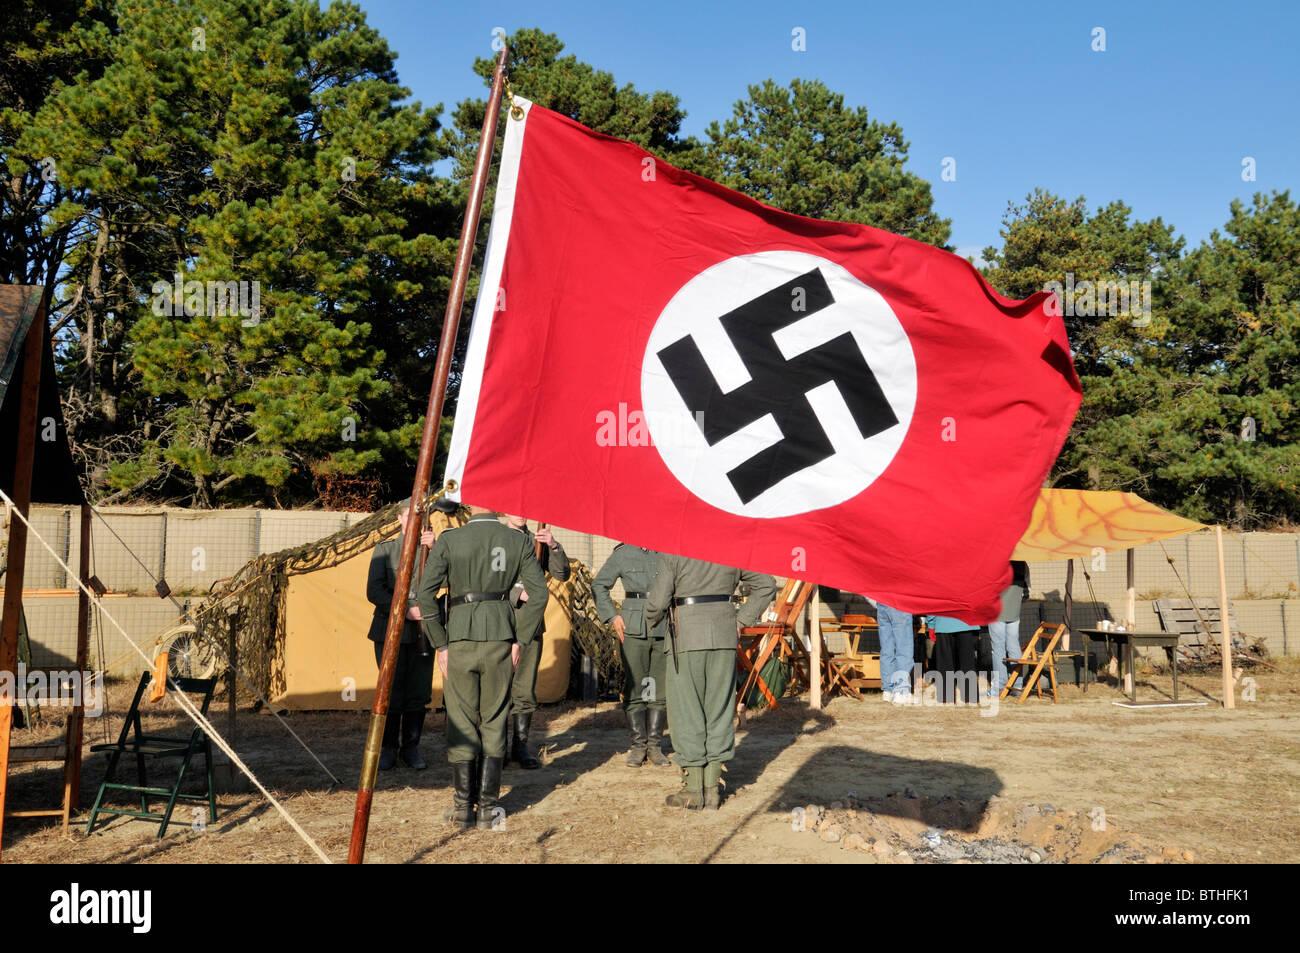 Flags Stockfotos Flags Bilder Seite 56b3b2c6513